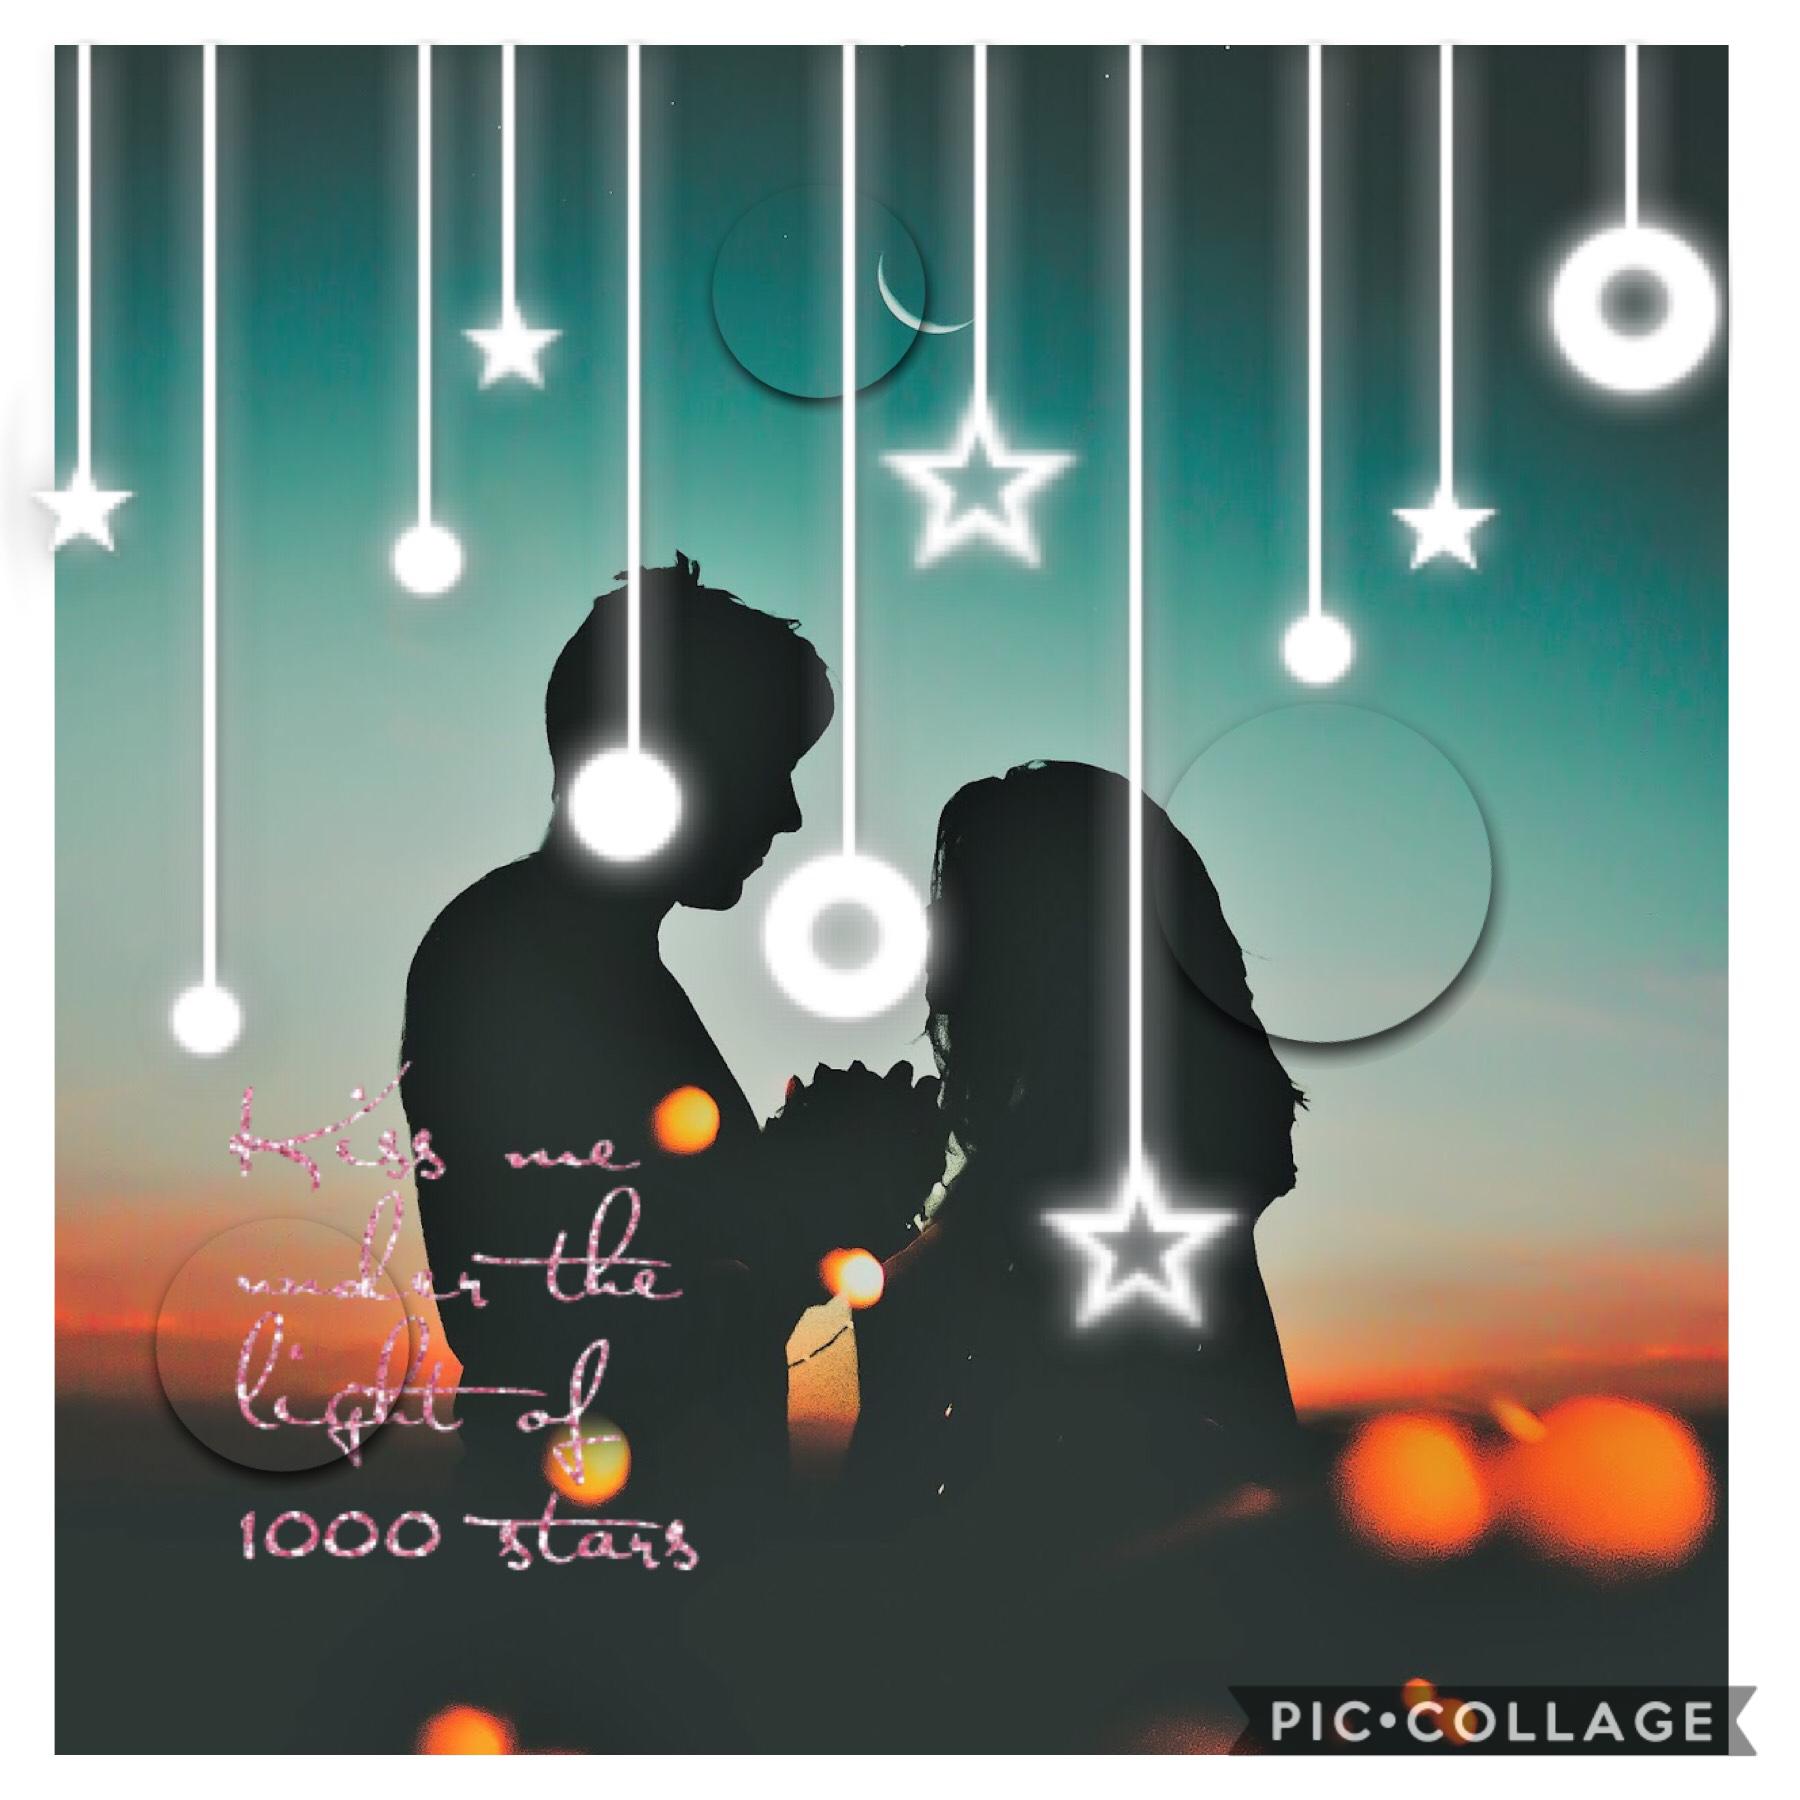 Kiss me under the light of 1000 stars